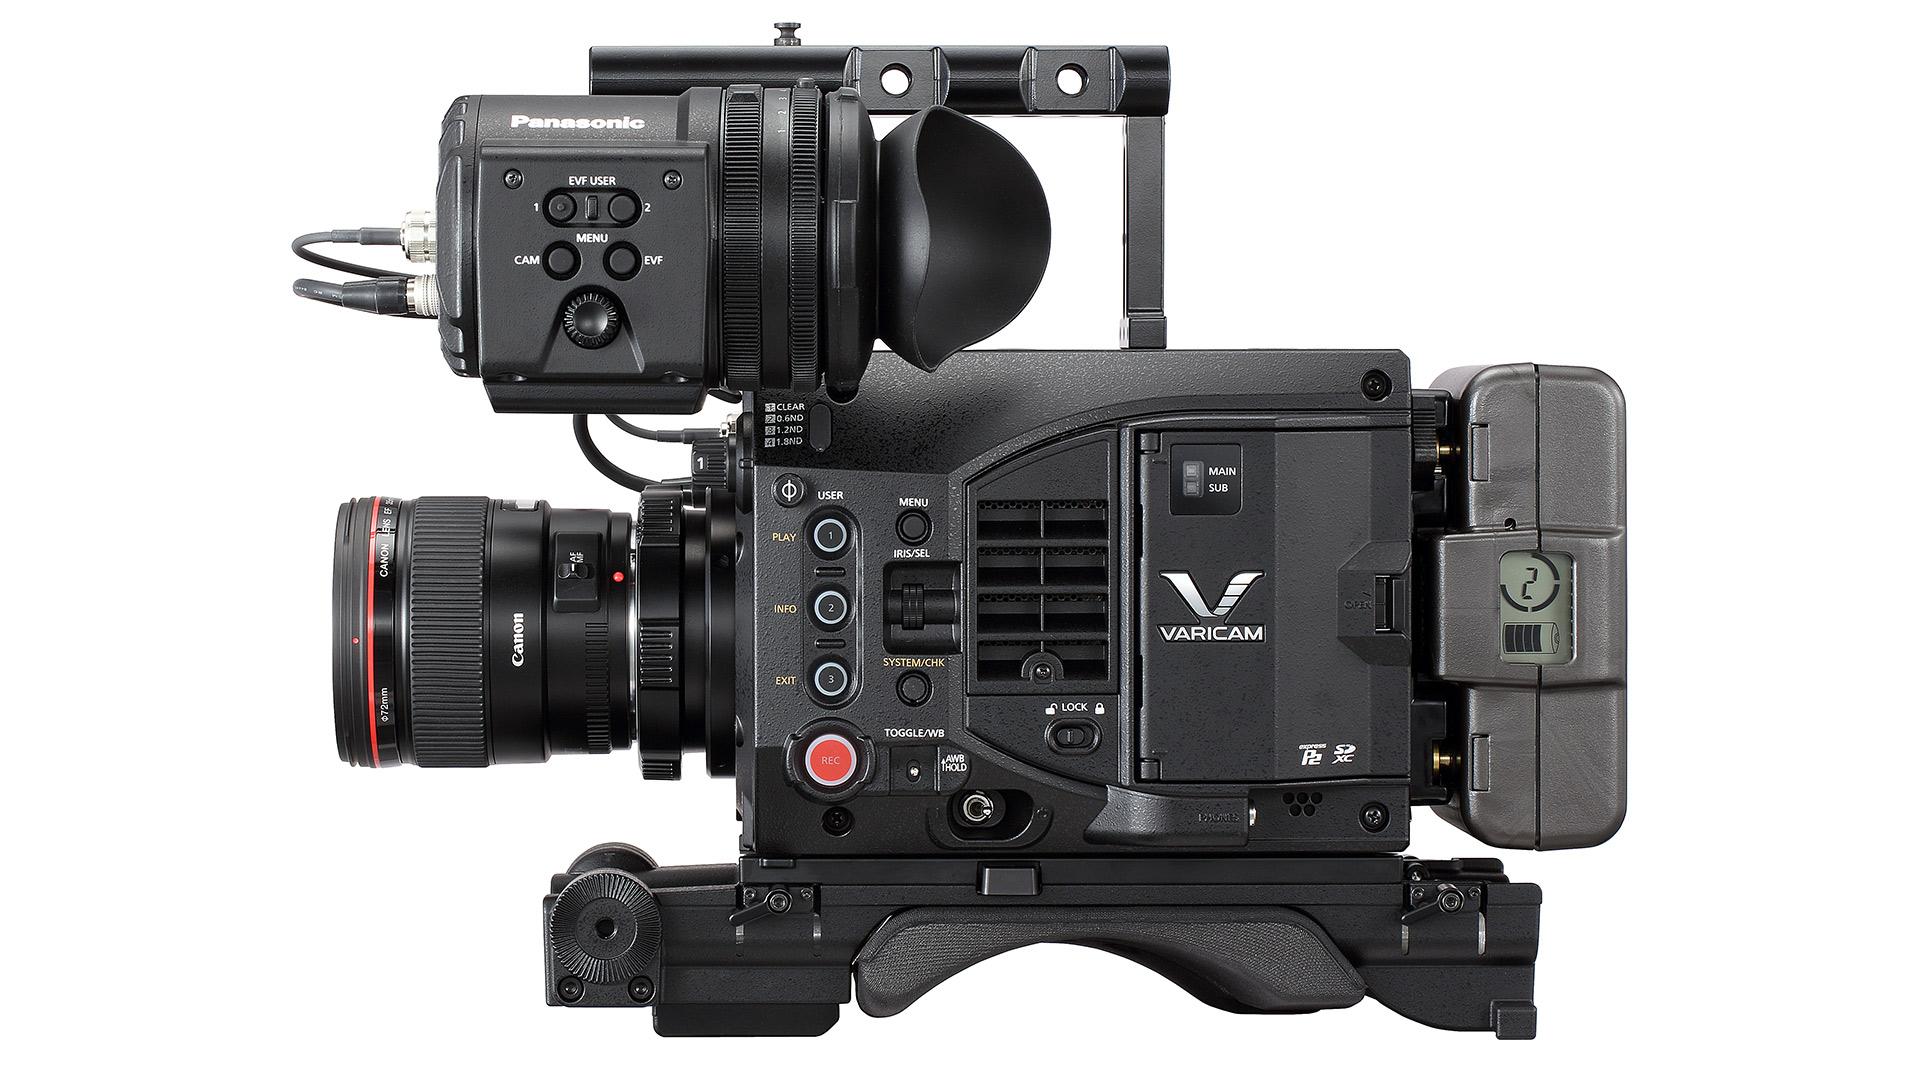 Canon C300 markii Vs Panasonic Varicam LT